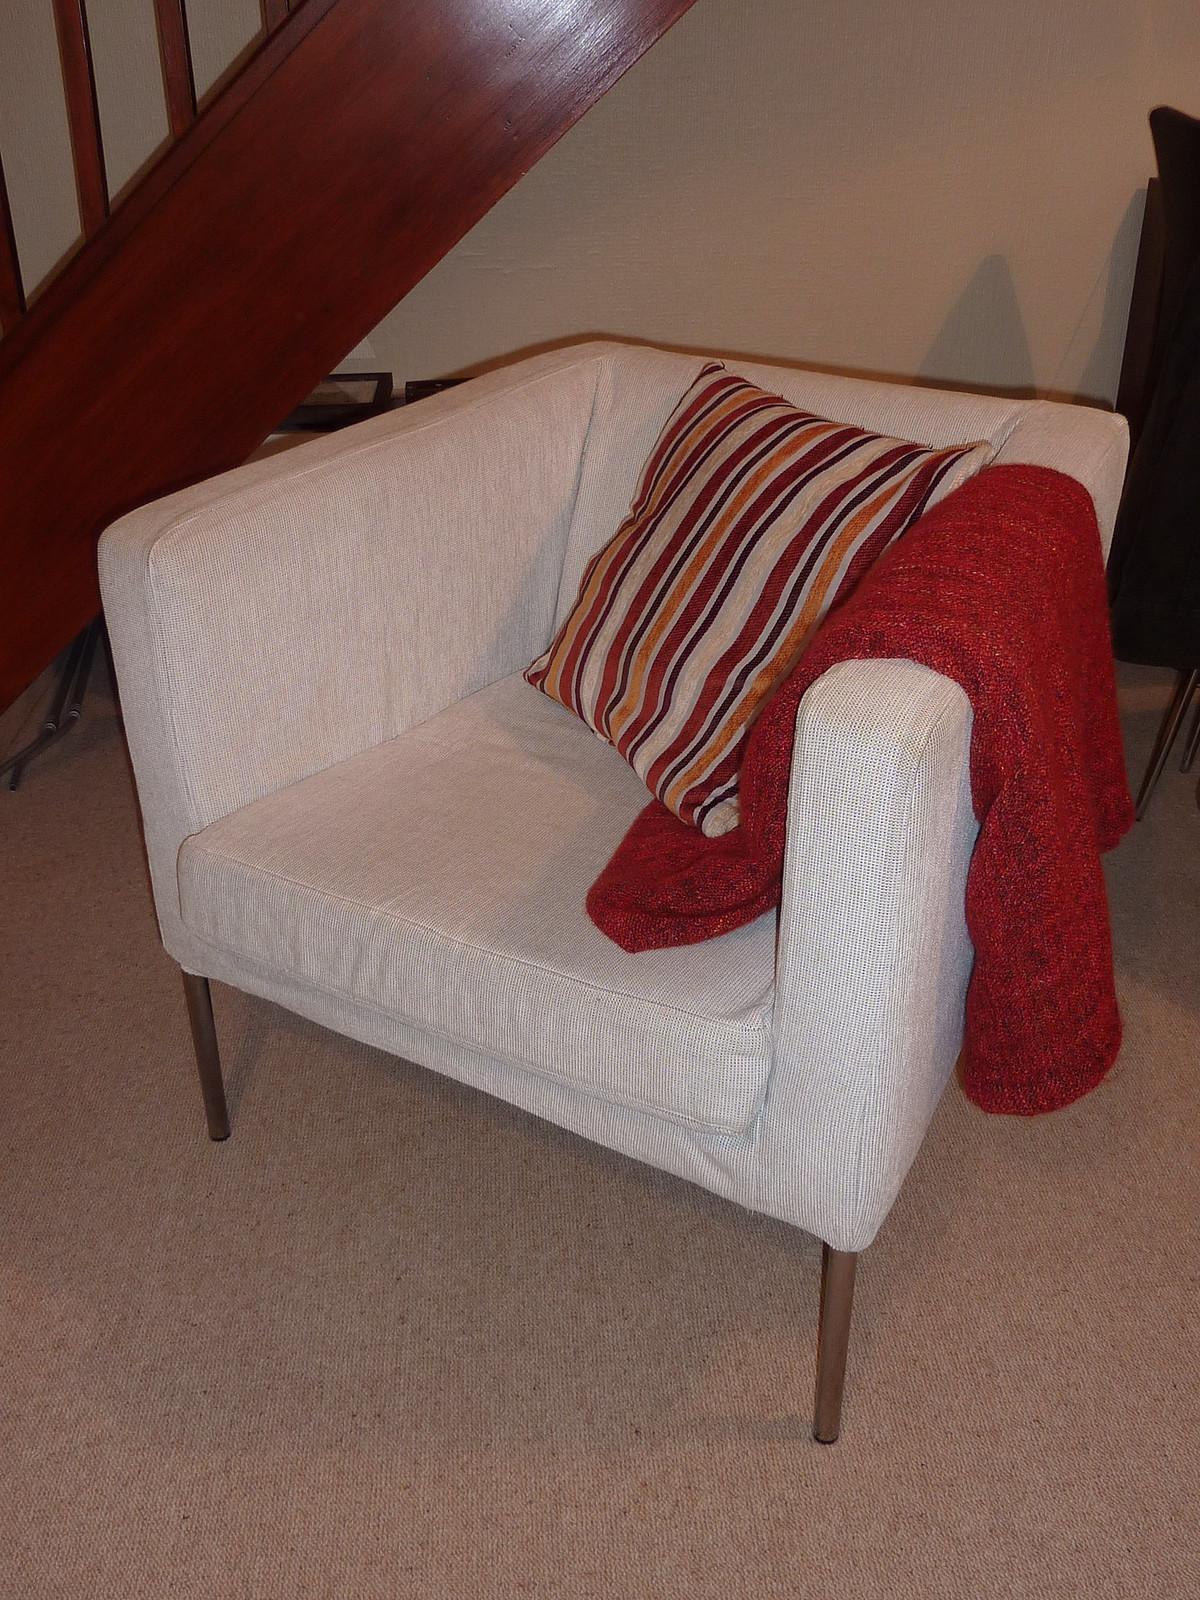 Wondrous Ikea Klappsta Armchair With Cover 40 Flickr Photo Inzonedesignstudio Interior Chair Design Inzonedesignstudiocom